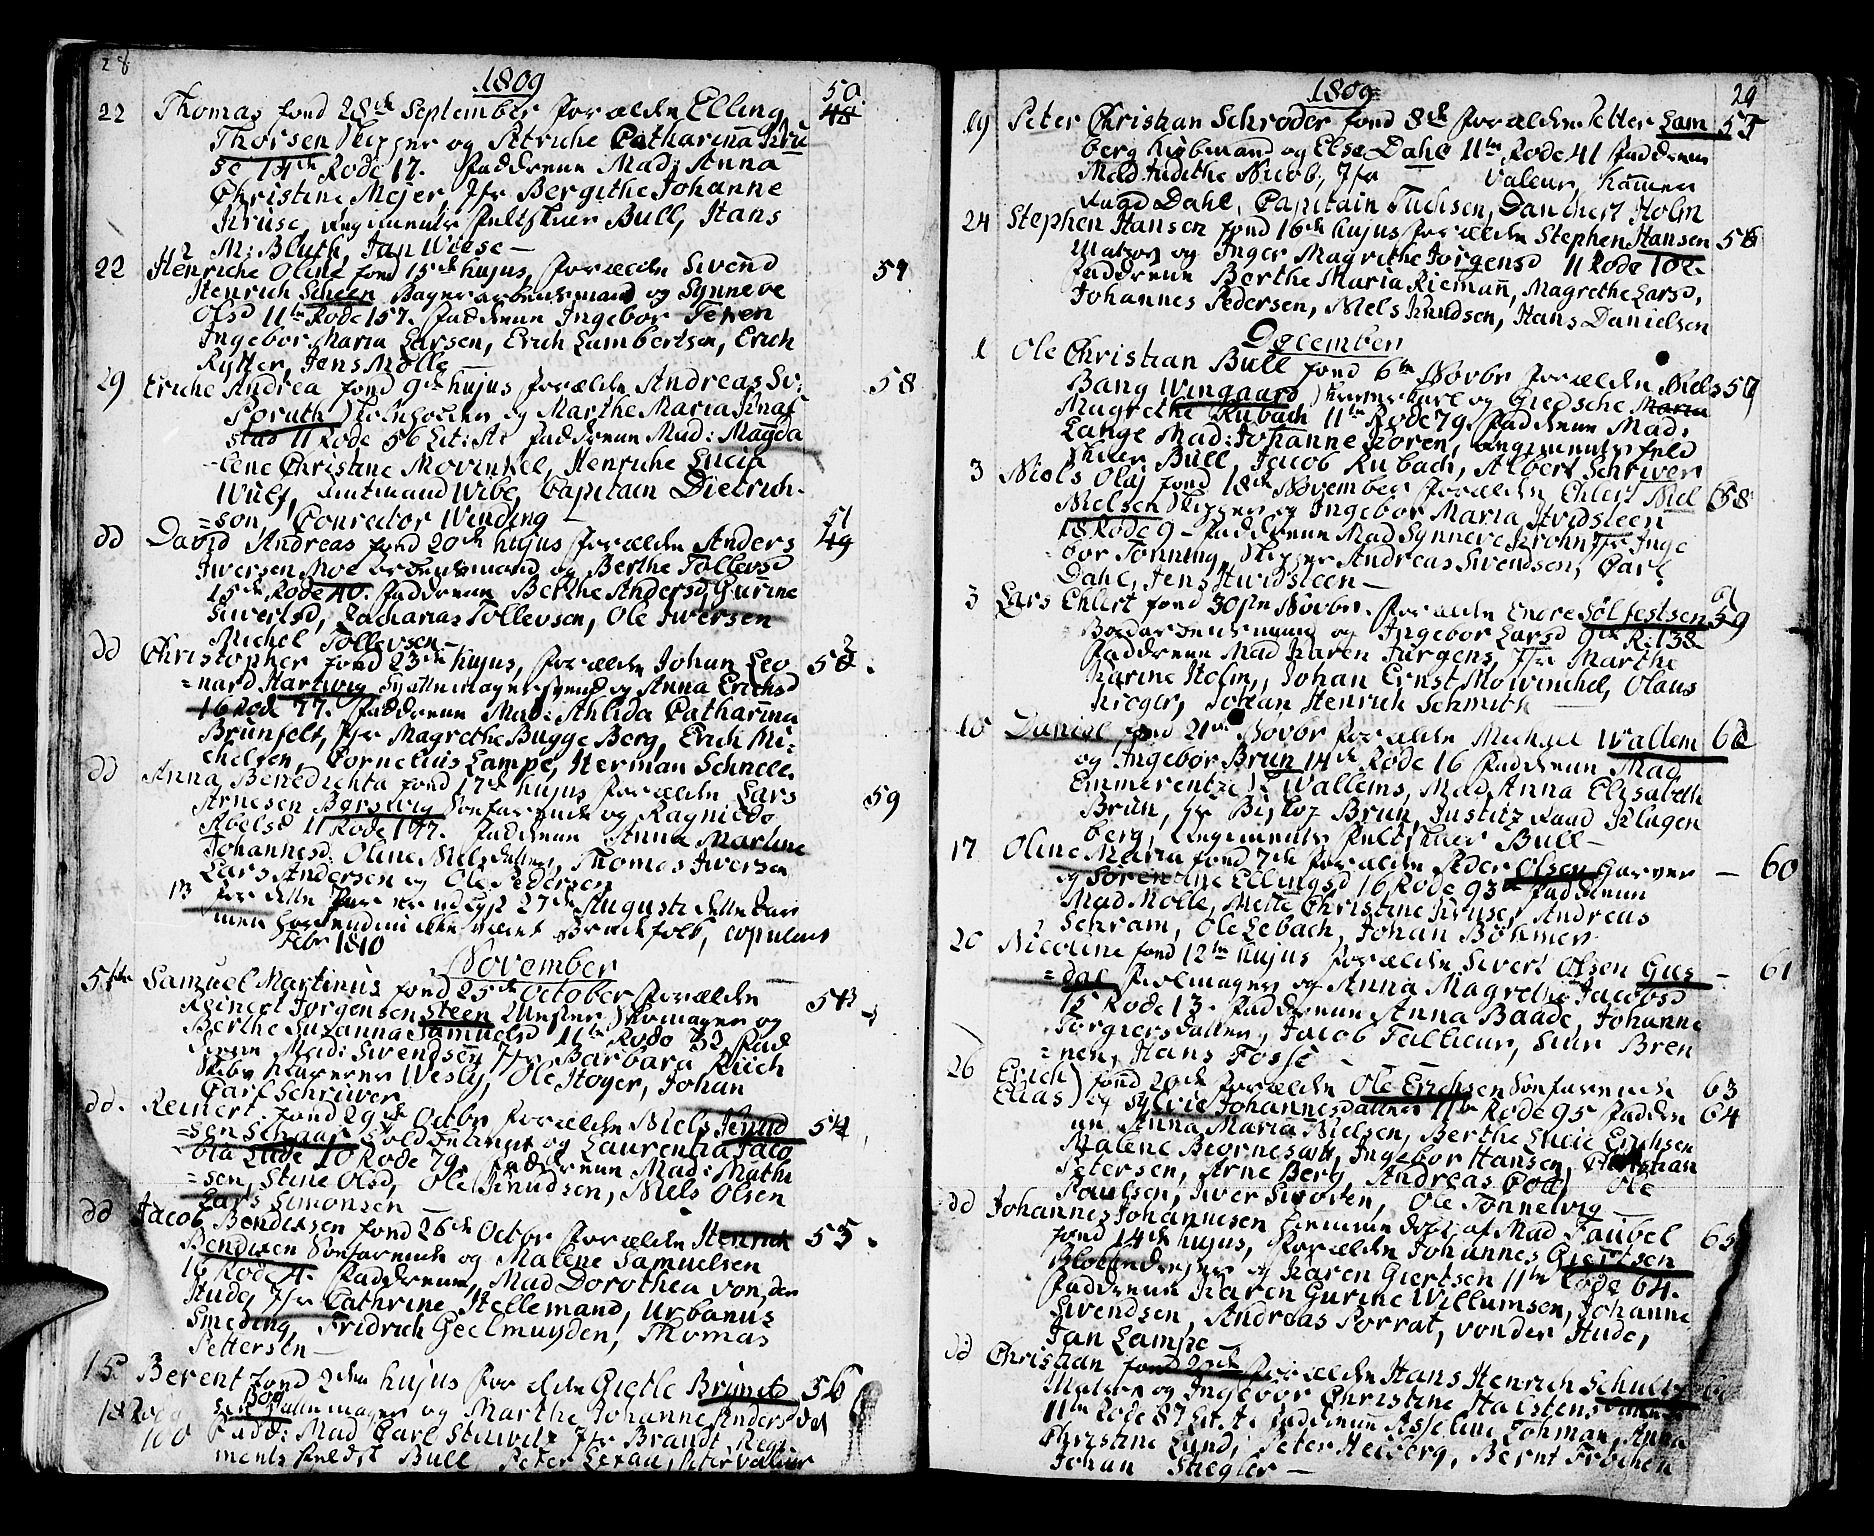 SAB, Domkirken Sokneprestembete, H/Haa/L0005: Ministerialbok nr. A 5, 1808-1820, s. 28-29